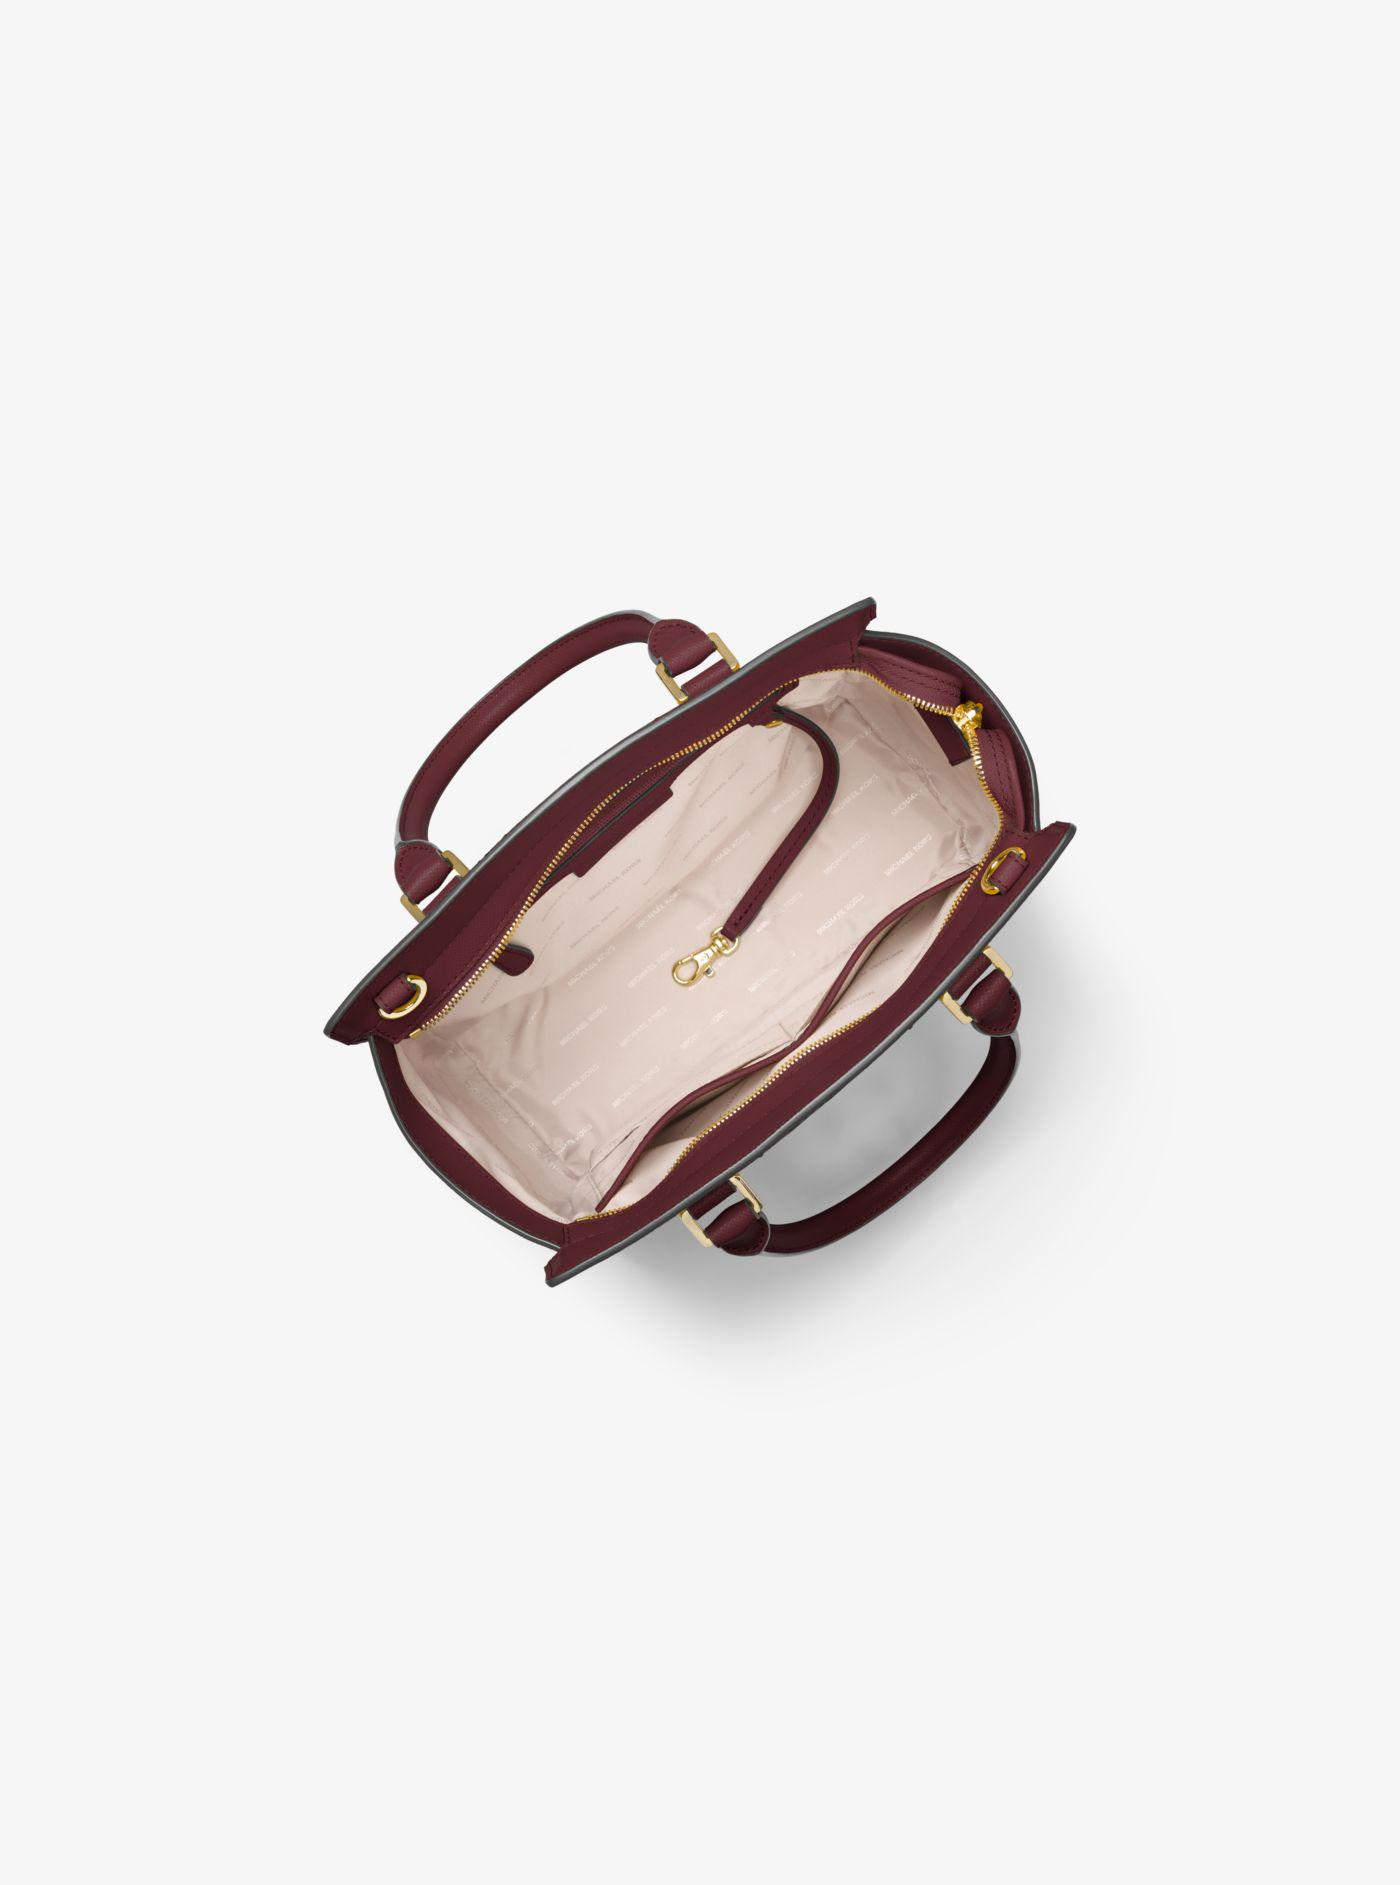 295725c25e80 ... discount code for michael kors multicolor selma saffiano leather medium  satchel lyst. view fullscreen 394de